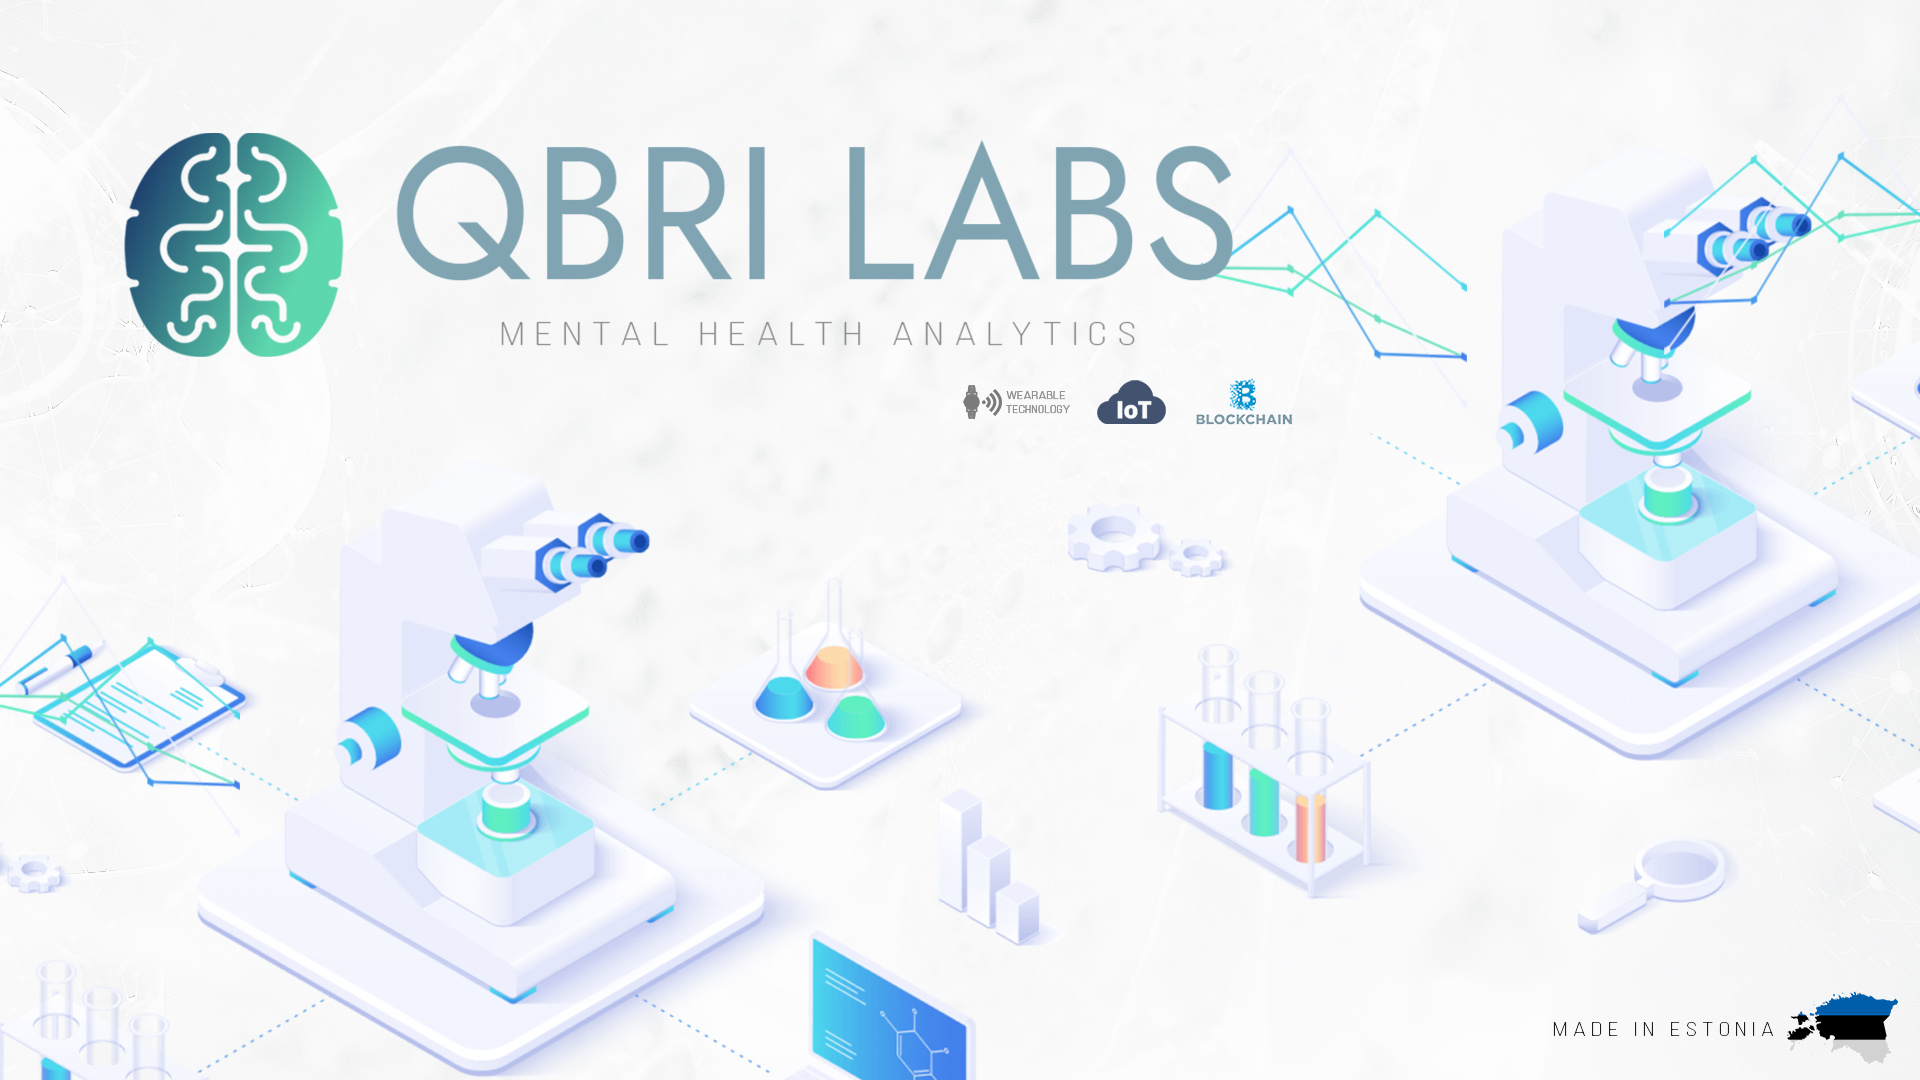 QBRI Labs banner image